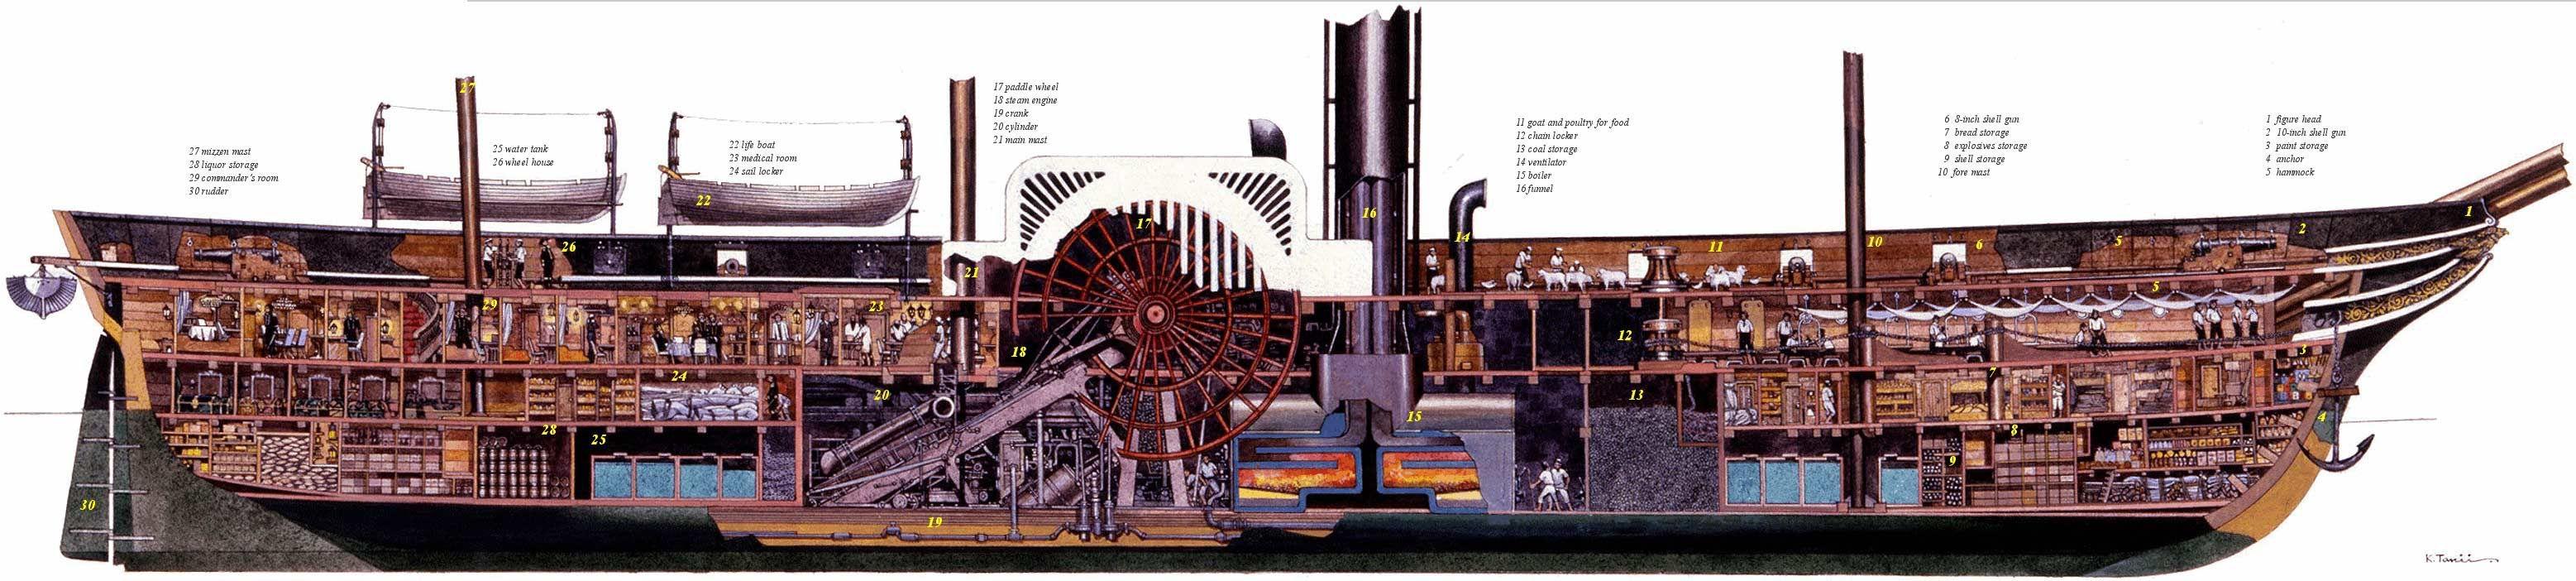 paddle wheel steamer cross section ship schematics. Black Bedroom Furniture Sets. Home Design Ideas